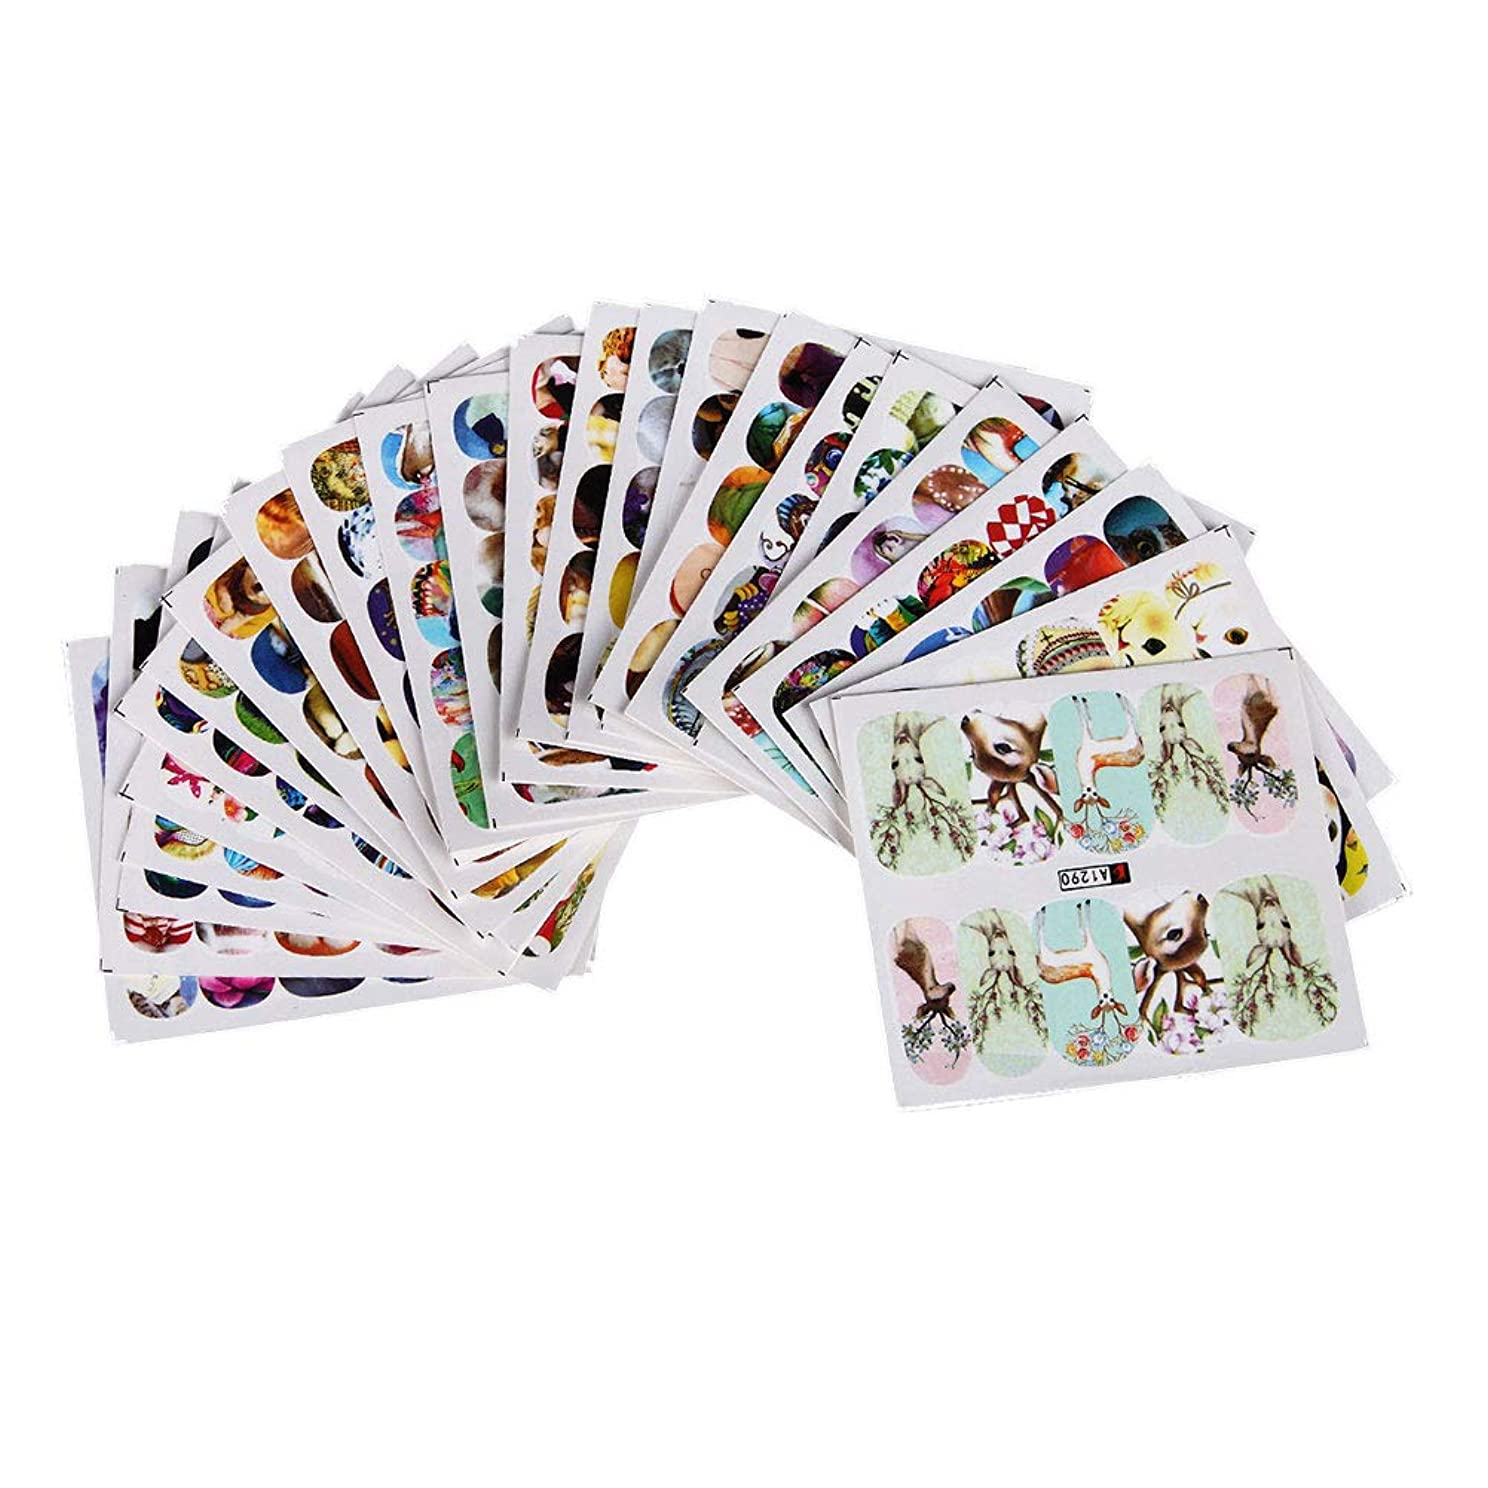 Healify ネイルシール ネイルステッカー 花 动物 可愛いネイル飾り 24枚セット